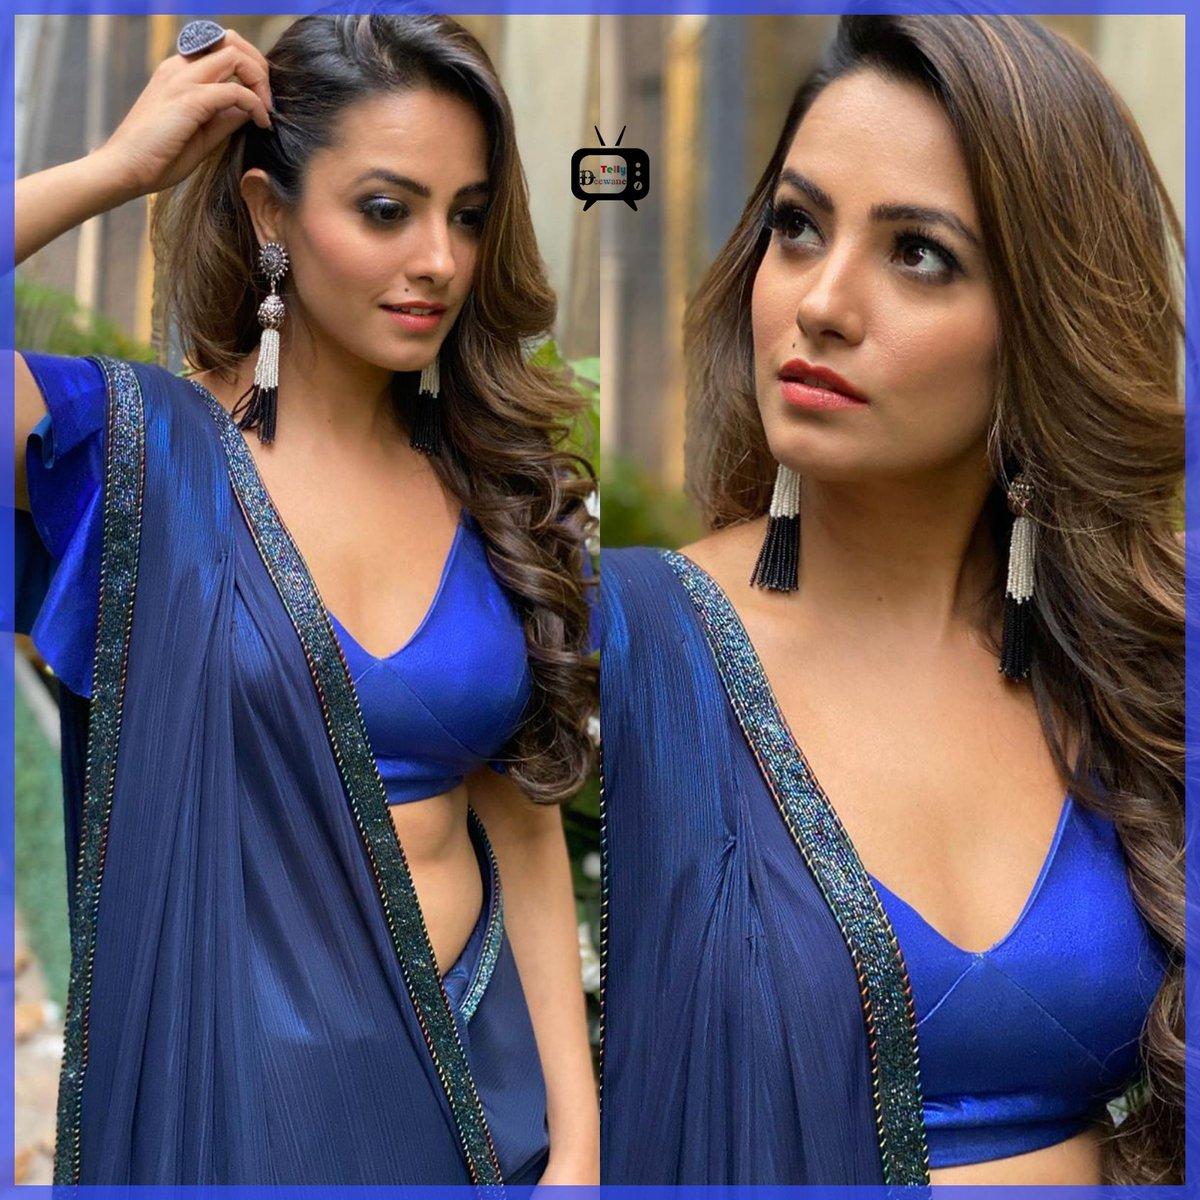 Gorgeous Anita Hassanandani #AnitaHassanandani #Naagin4  #AnitaHassanandaniReddy #Vishaka #Vish  #Naagin3 #Shagun #YHM  @TellyDeewanepic.twitter.com/FHs8kp9sBu